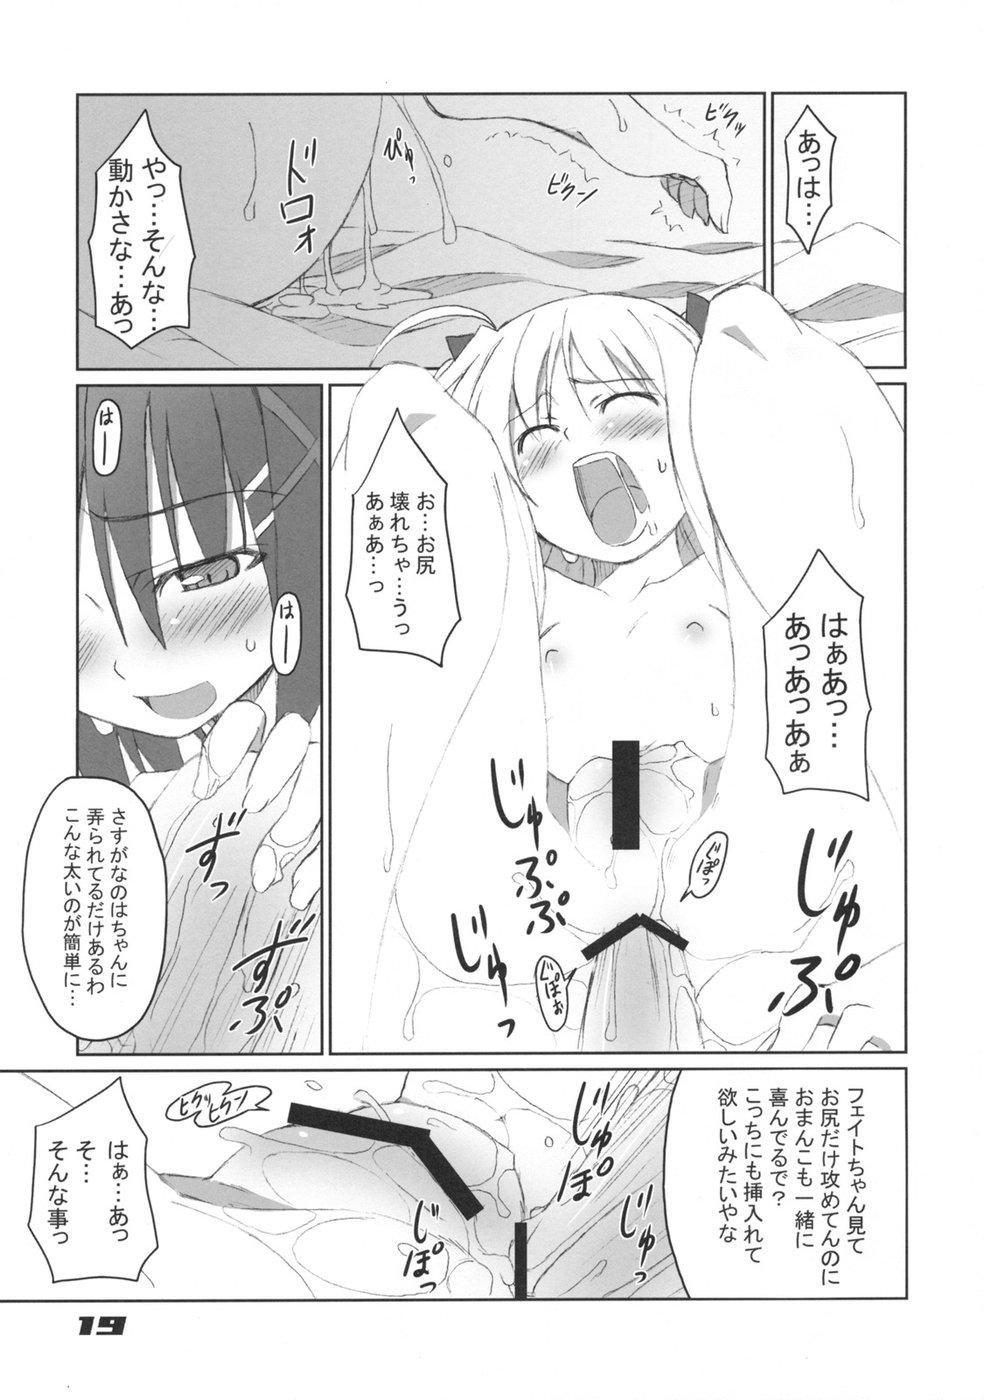 Fate-chan Igai to Moroi no A's 18